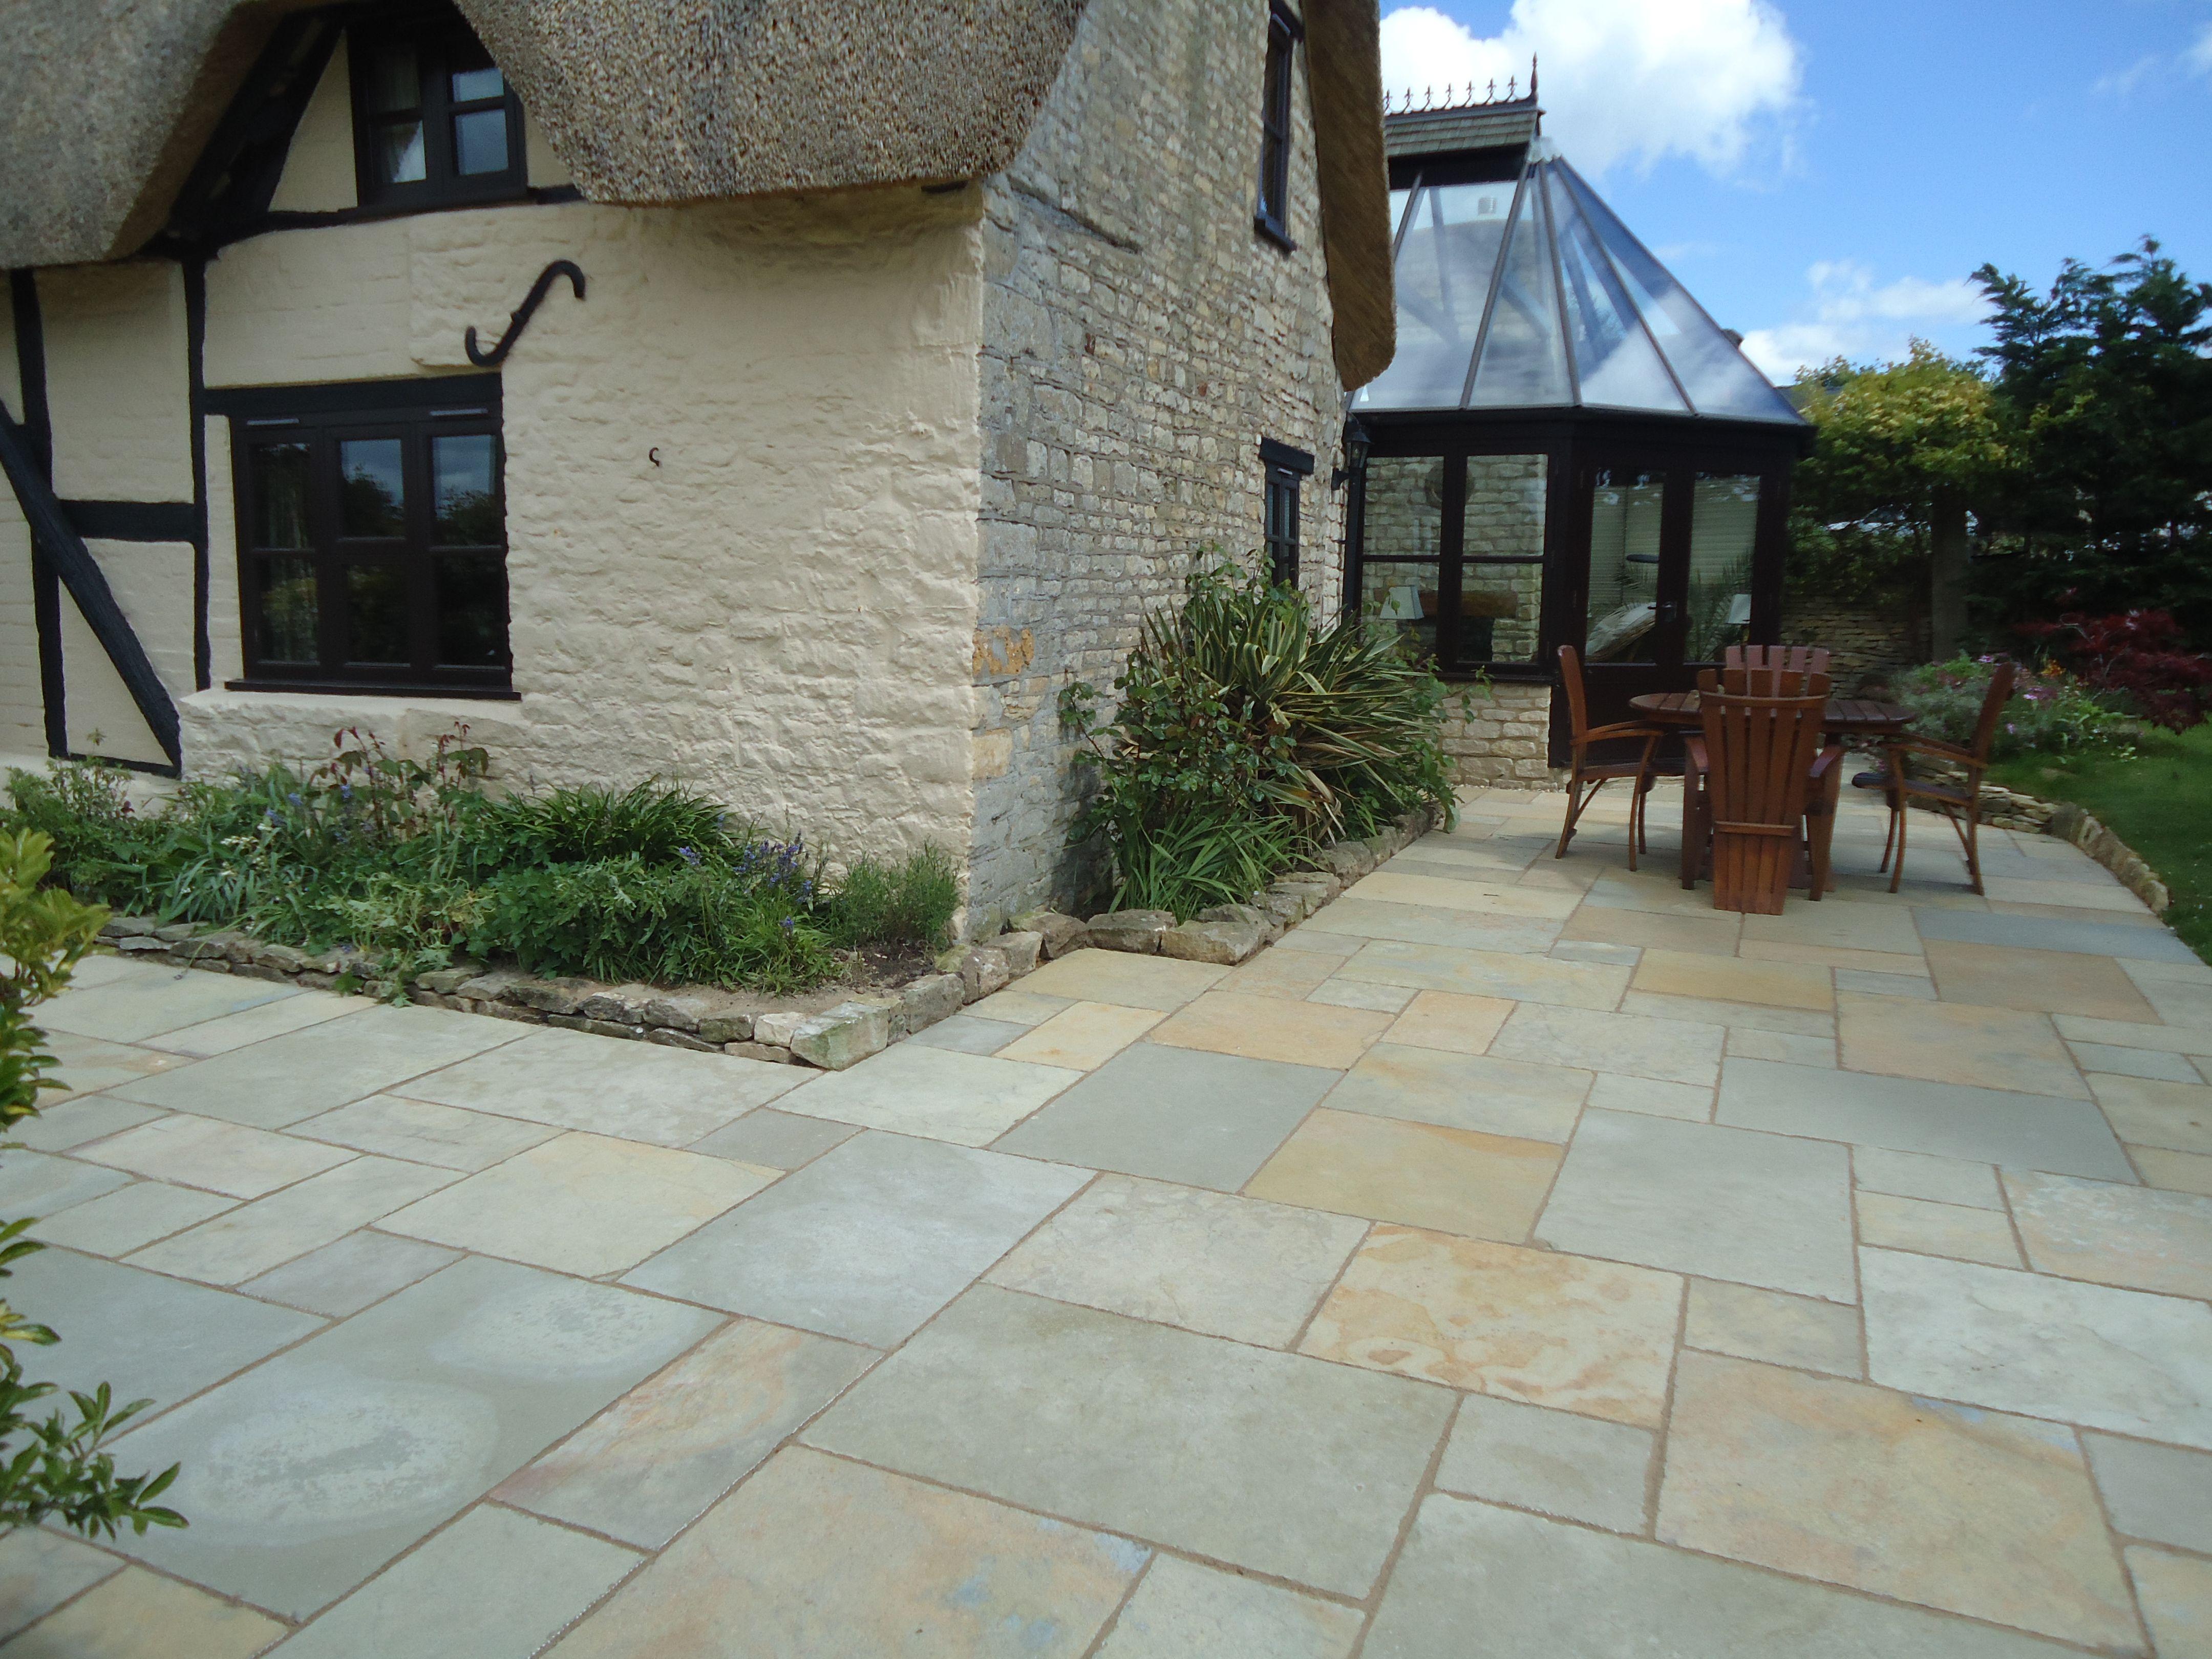 pavestone abbey limestone paving cosas que deseo probar